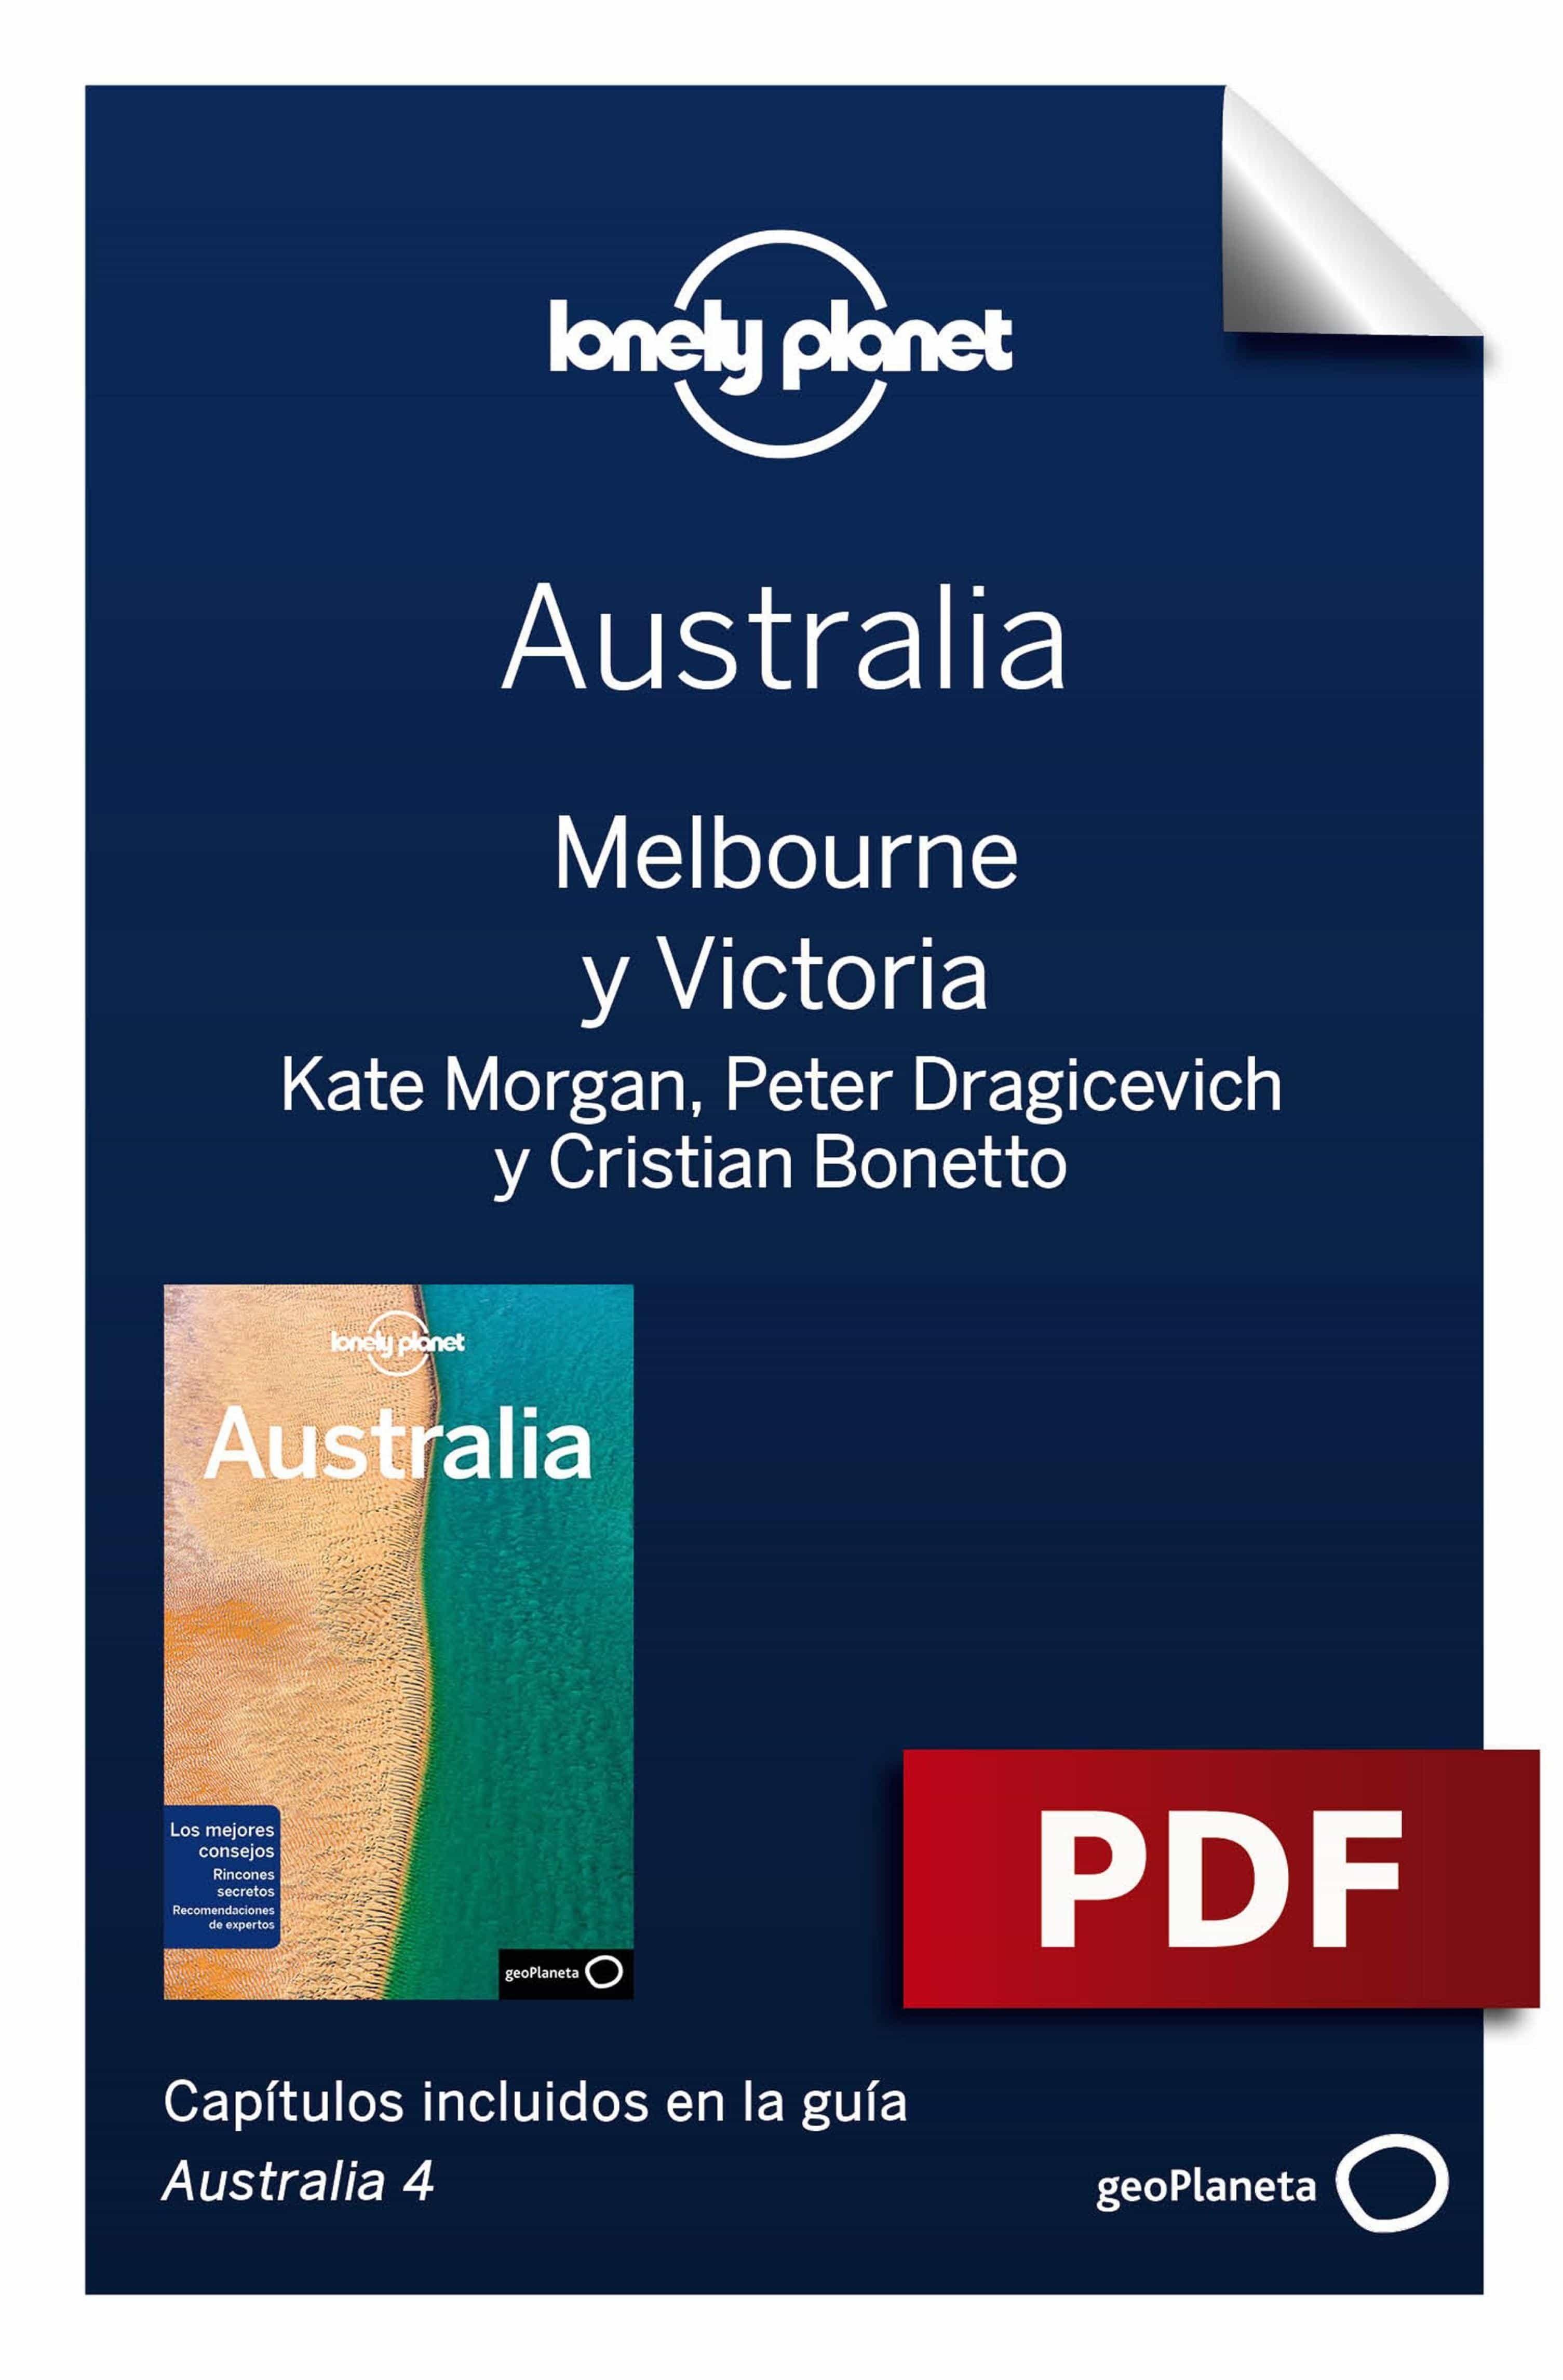 Australia 4_5. Melbourne Y Victoria, Trent Holden   por Brett Atkinson, Kate Armstrong